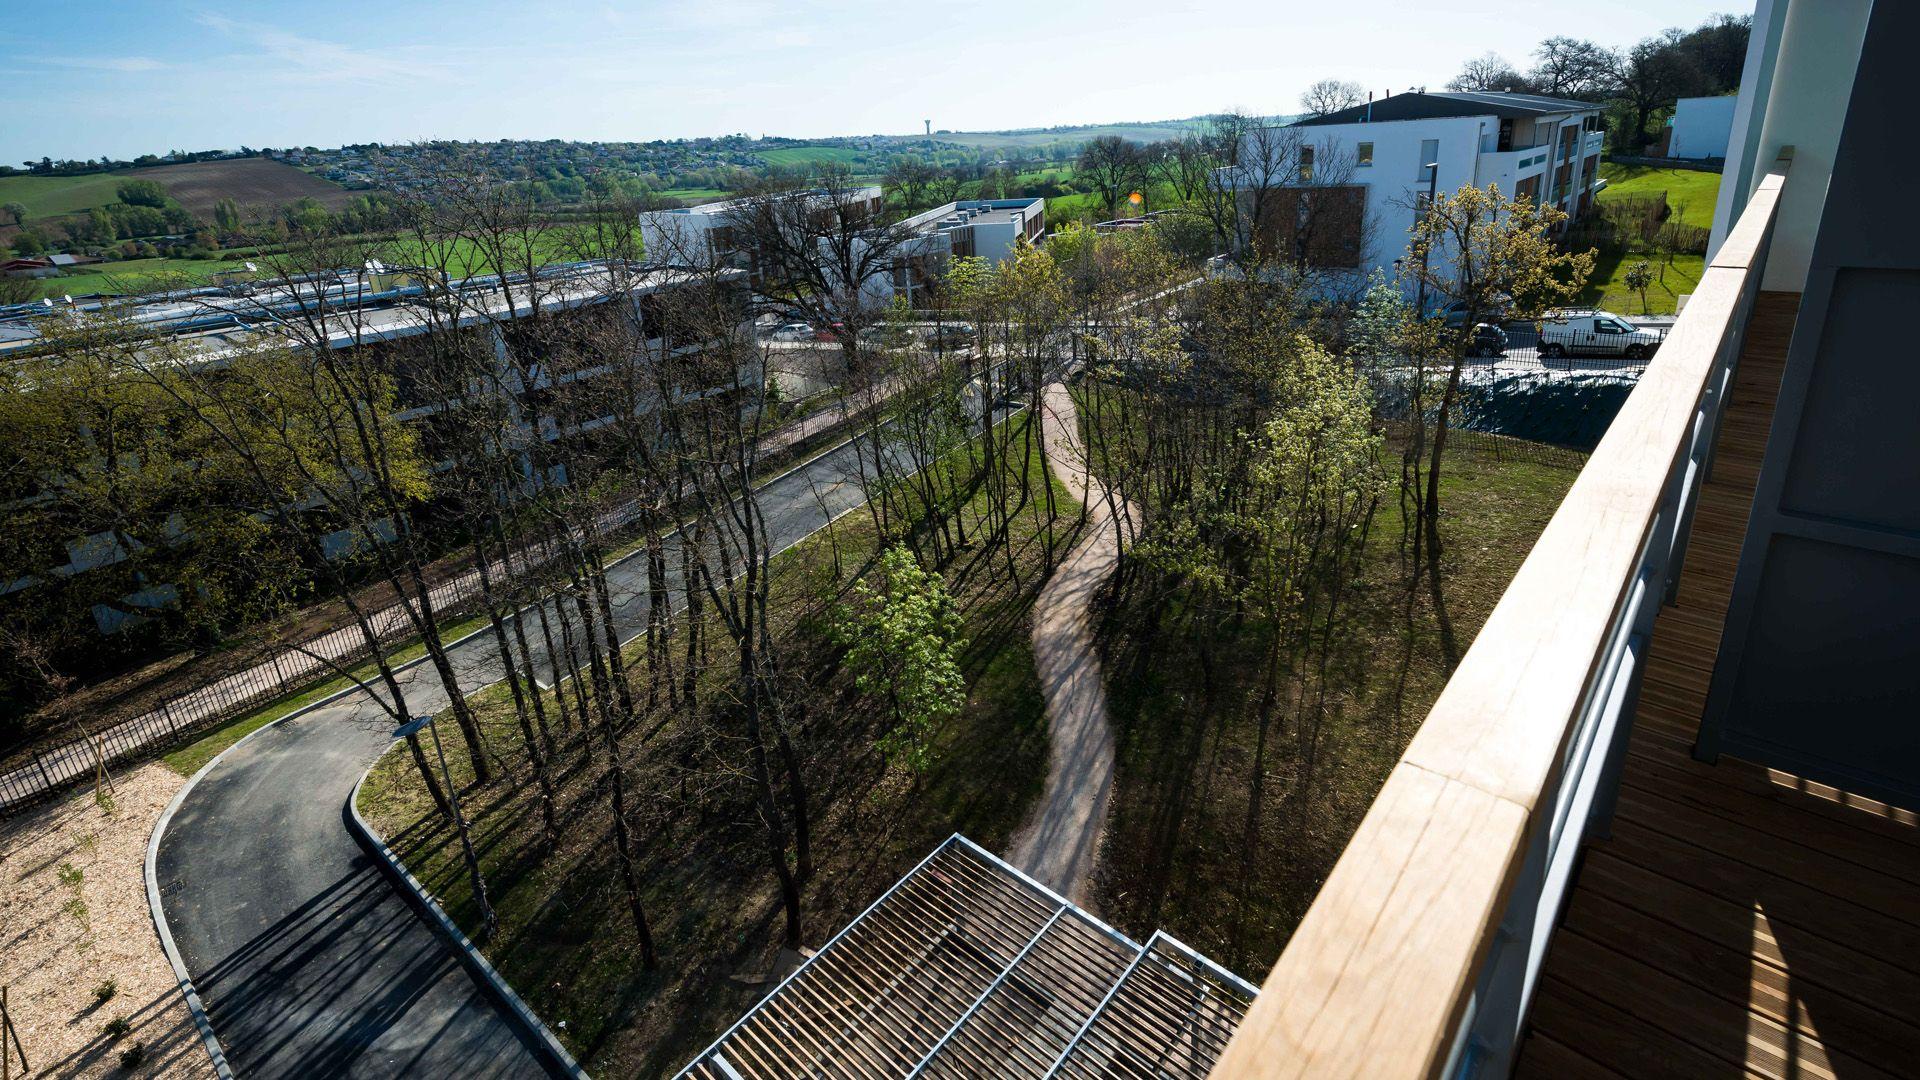 Seuil-architecture-residence-senior-vue-balcon-slid